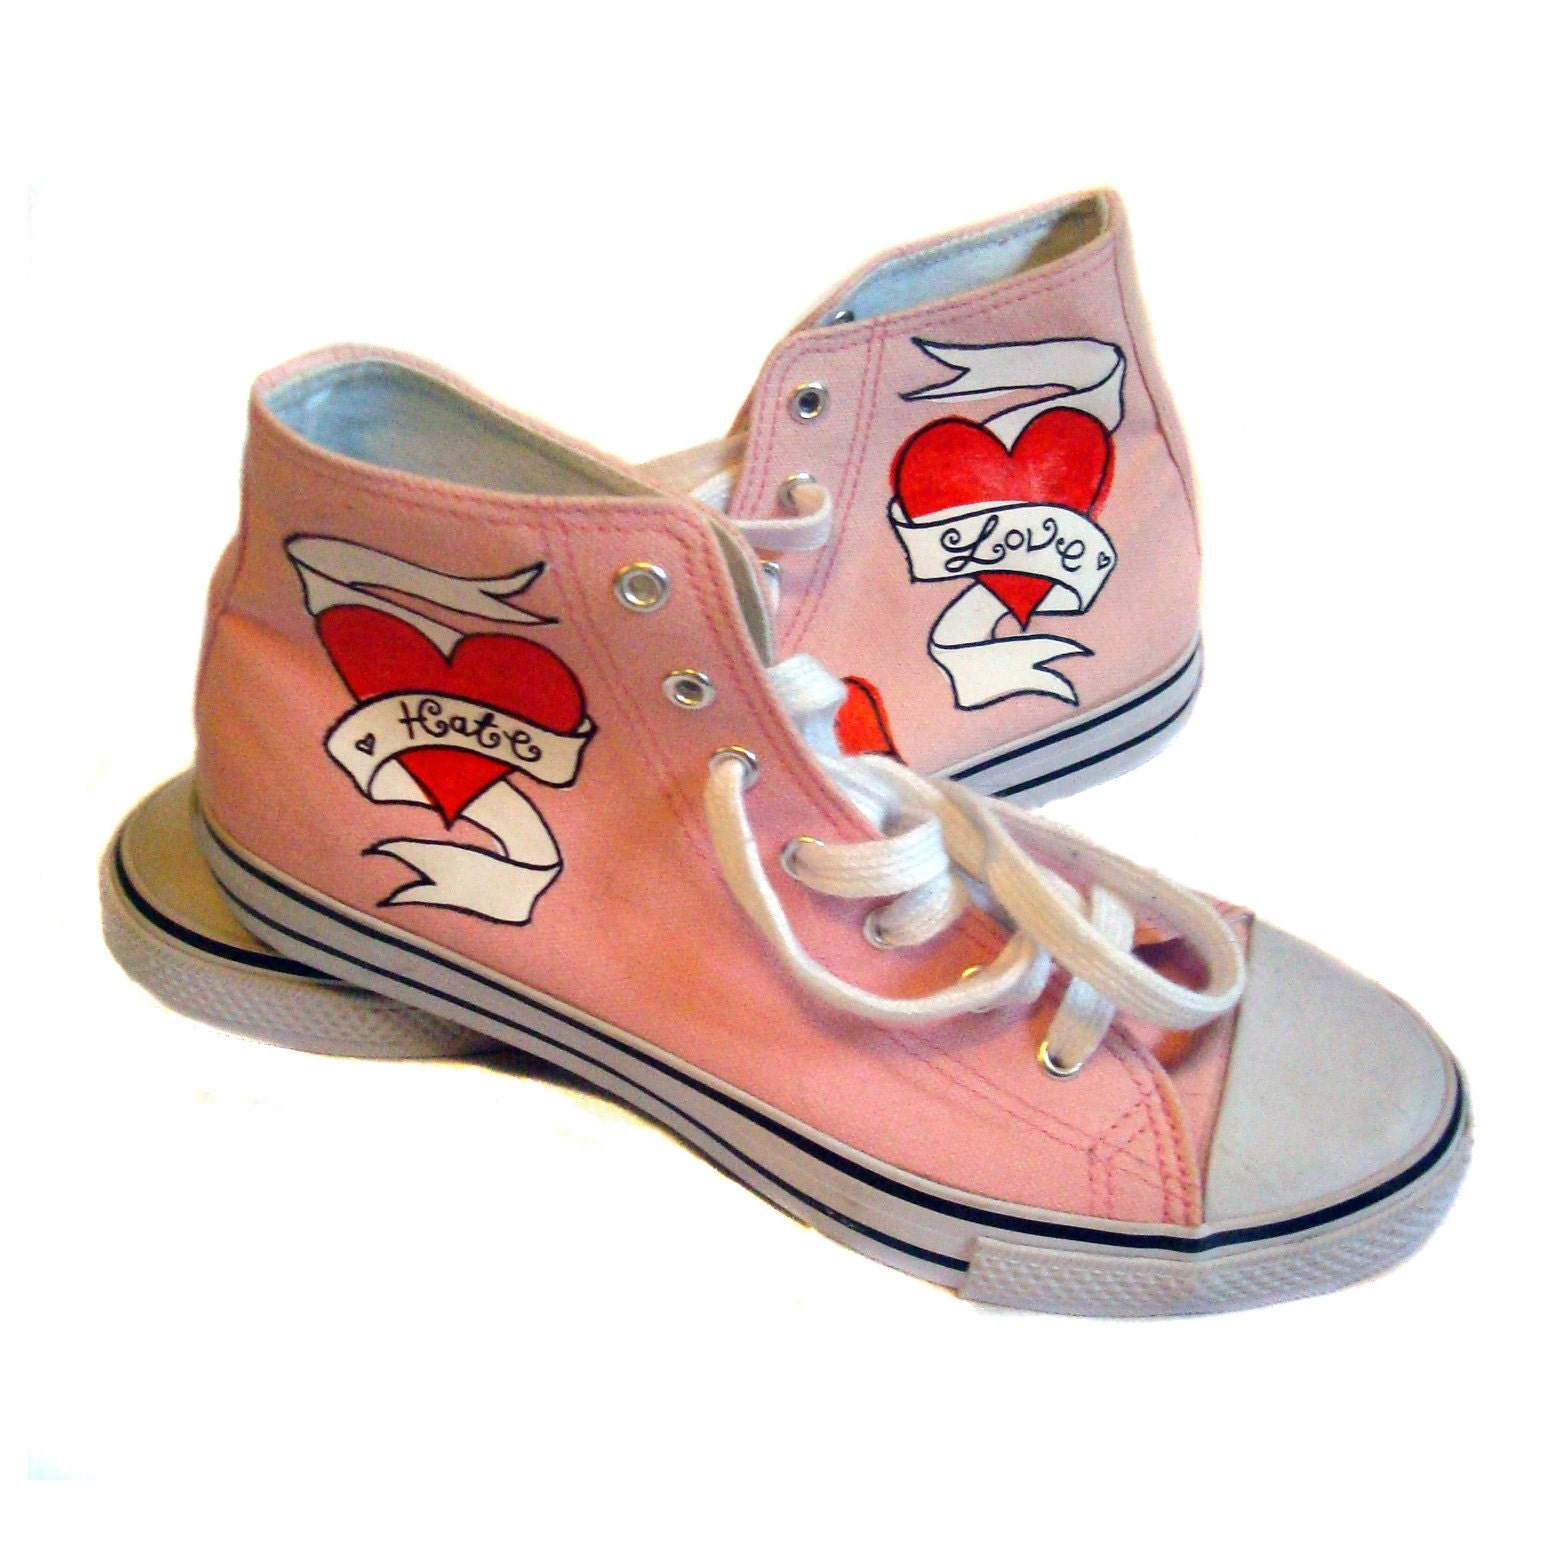 Miss Bunny Tattooed Canvas Boots. UK 7 / USA 9 / EU 40